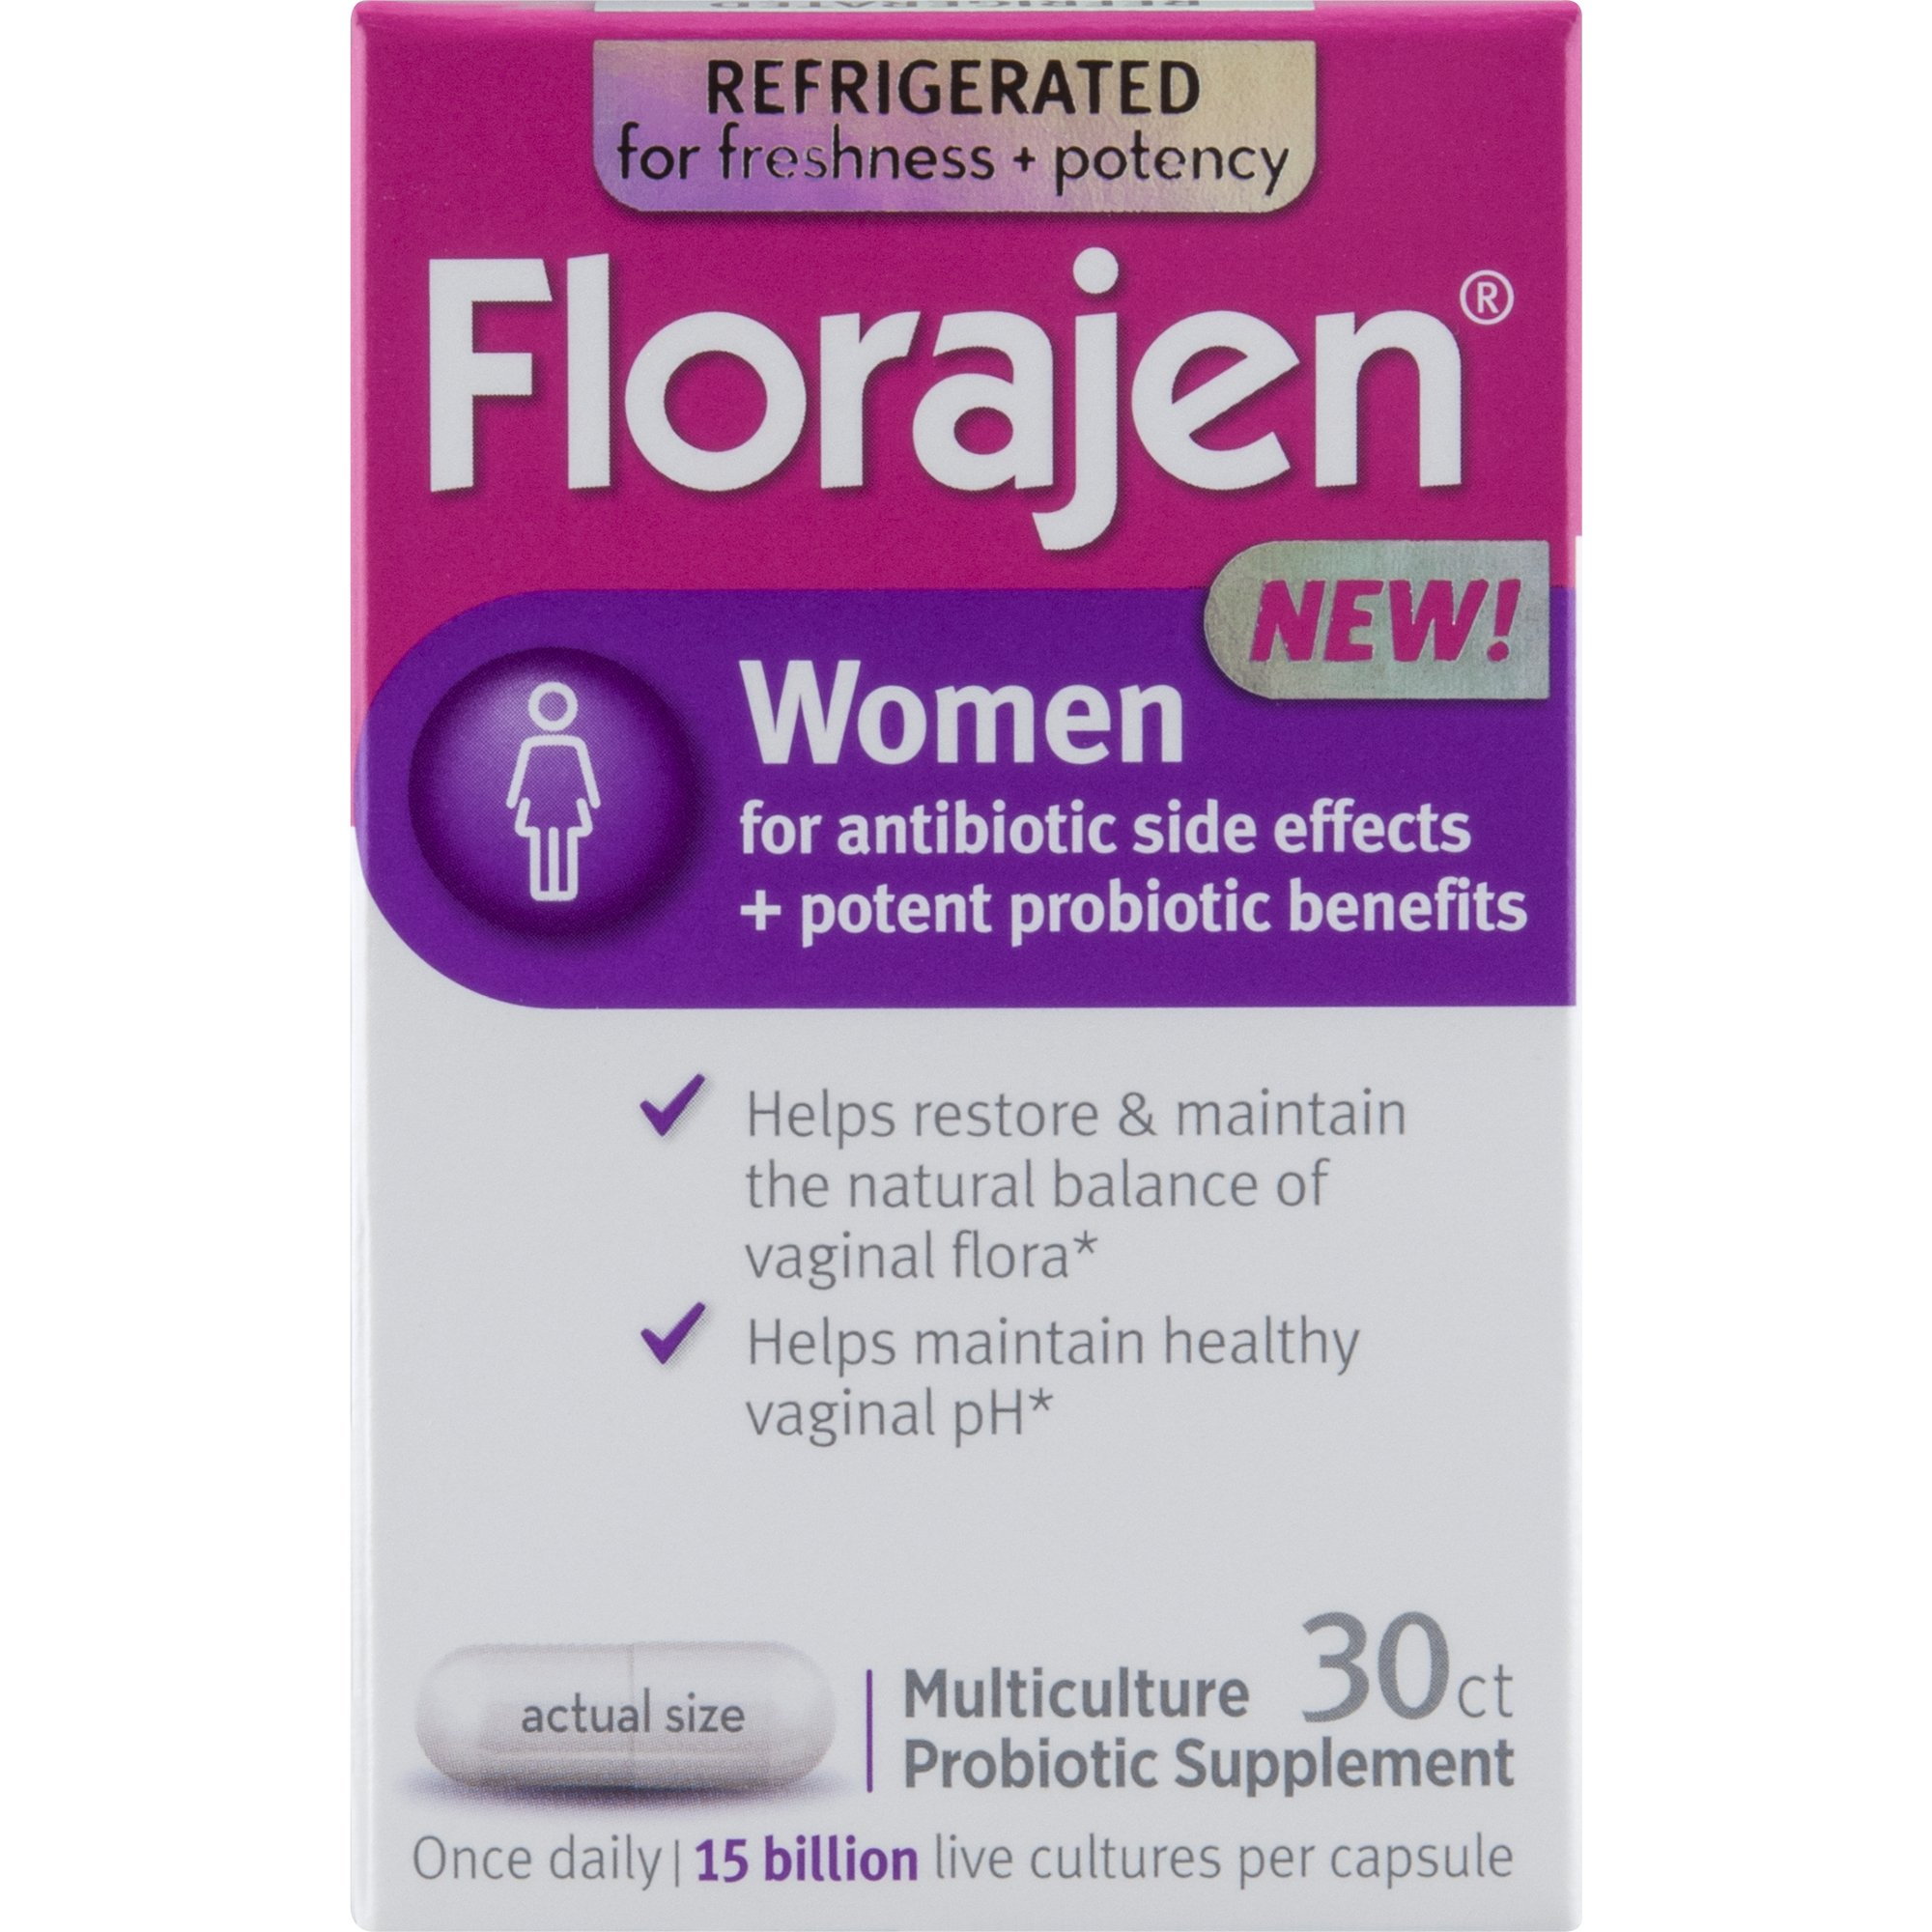 Watch Florajen3 Reviews video